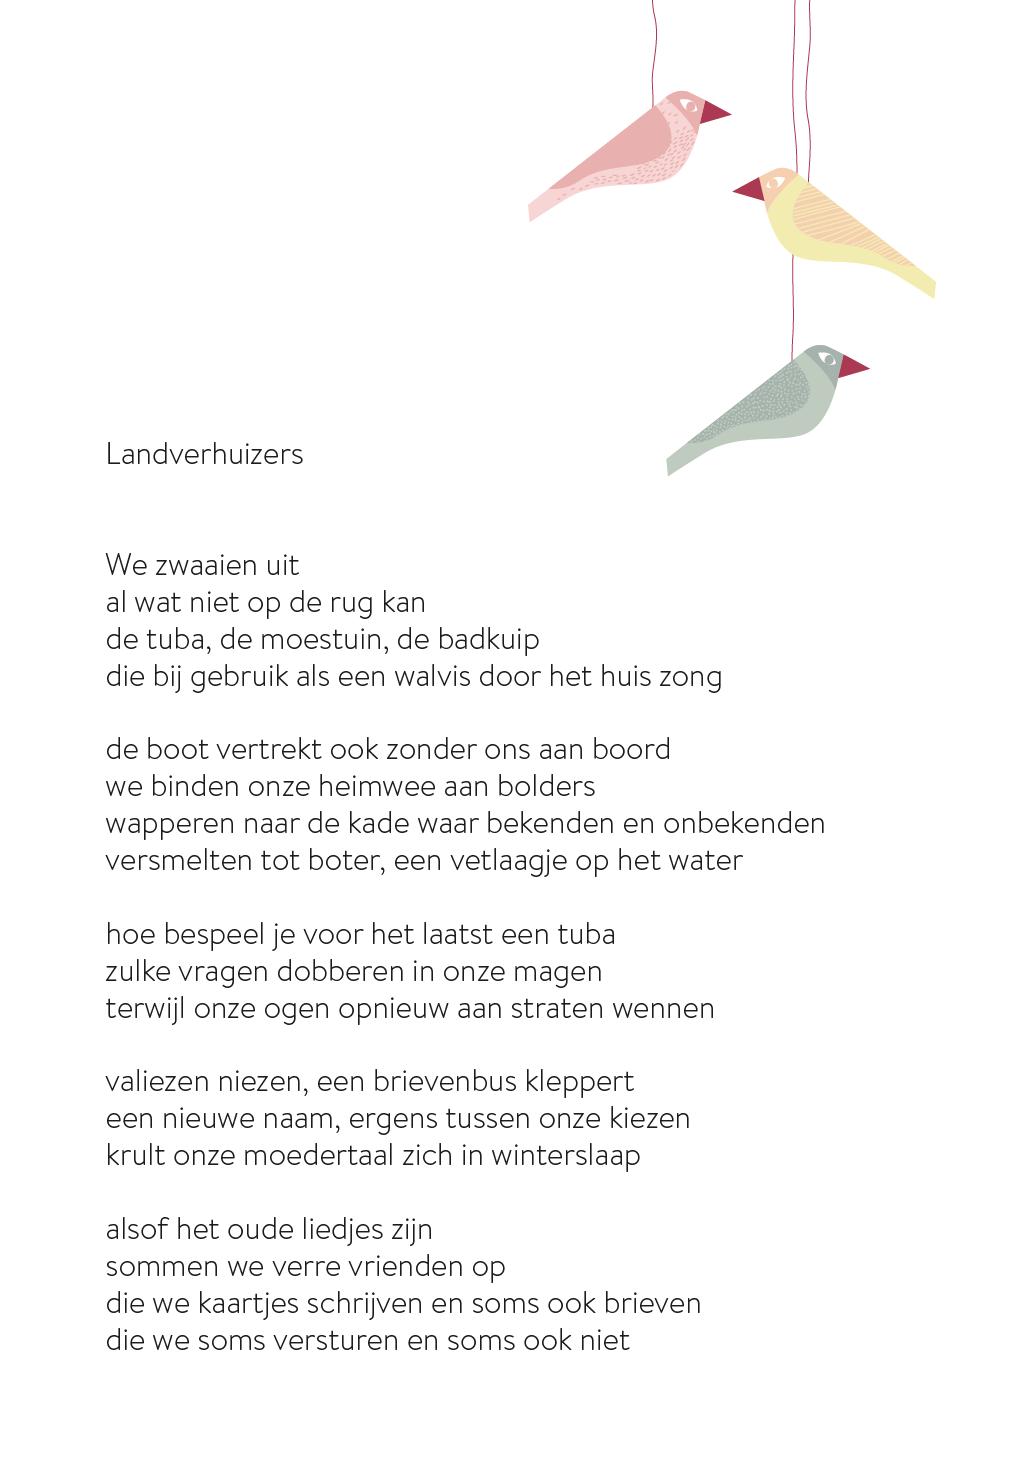 Landverhuizer